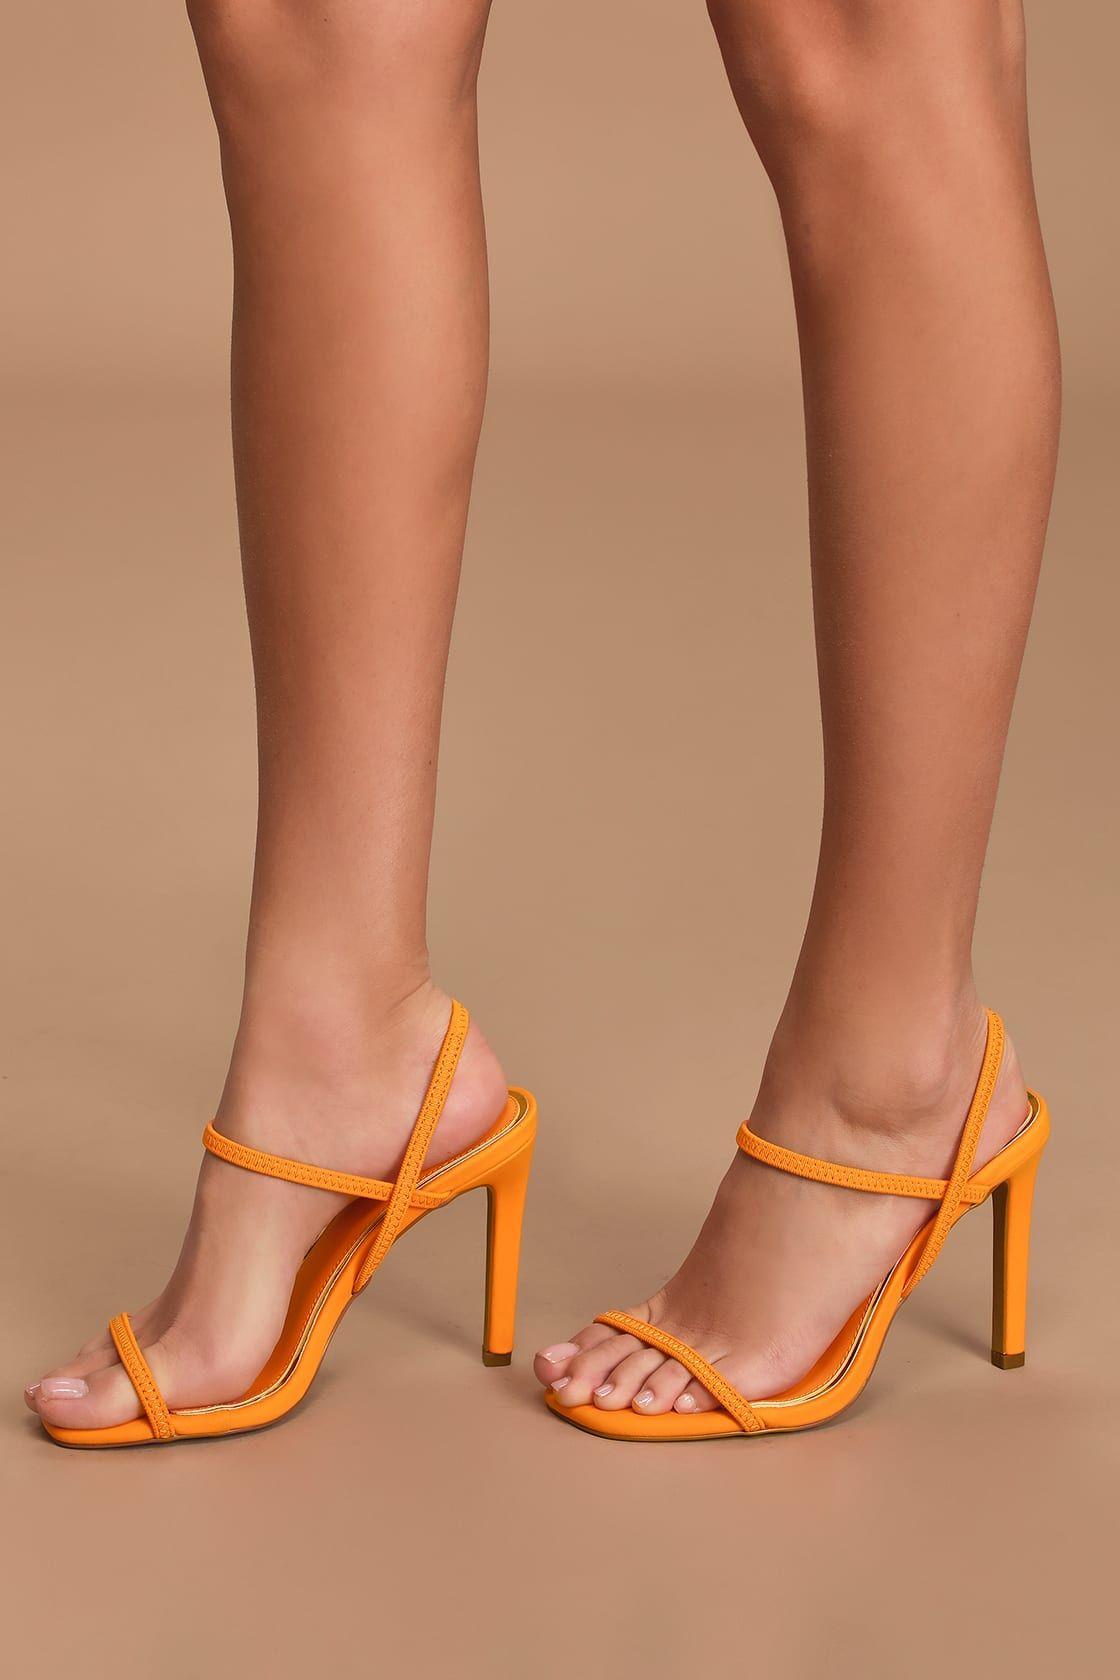 Sapato Estampado   Sapato Feminino Sandem Usado 29747702